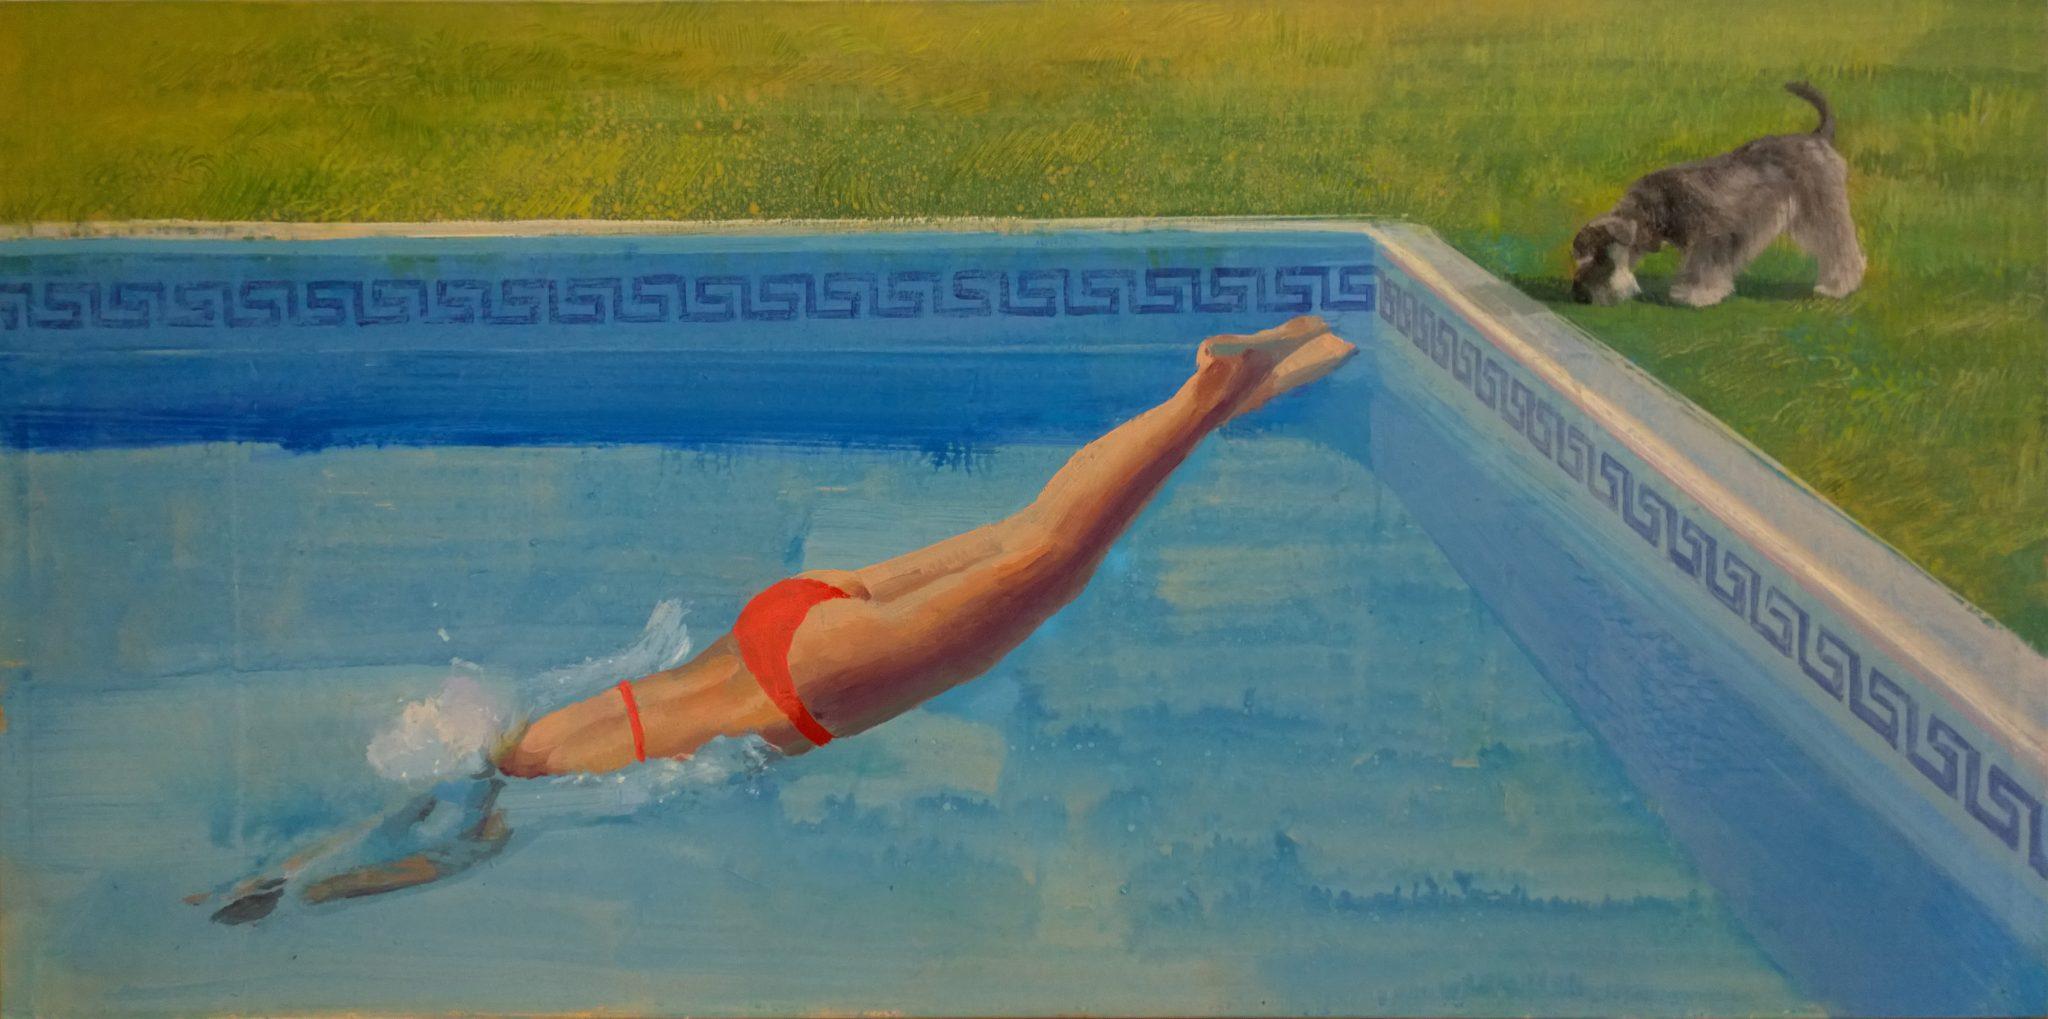 splash-alejandra-caballero-oleo-piscina-de-cabeza-hockney-mujer-bikini-perro